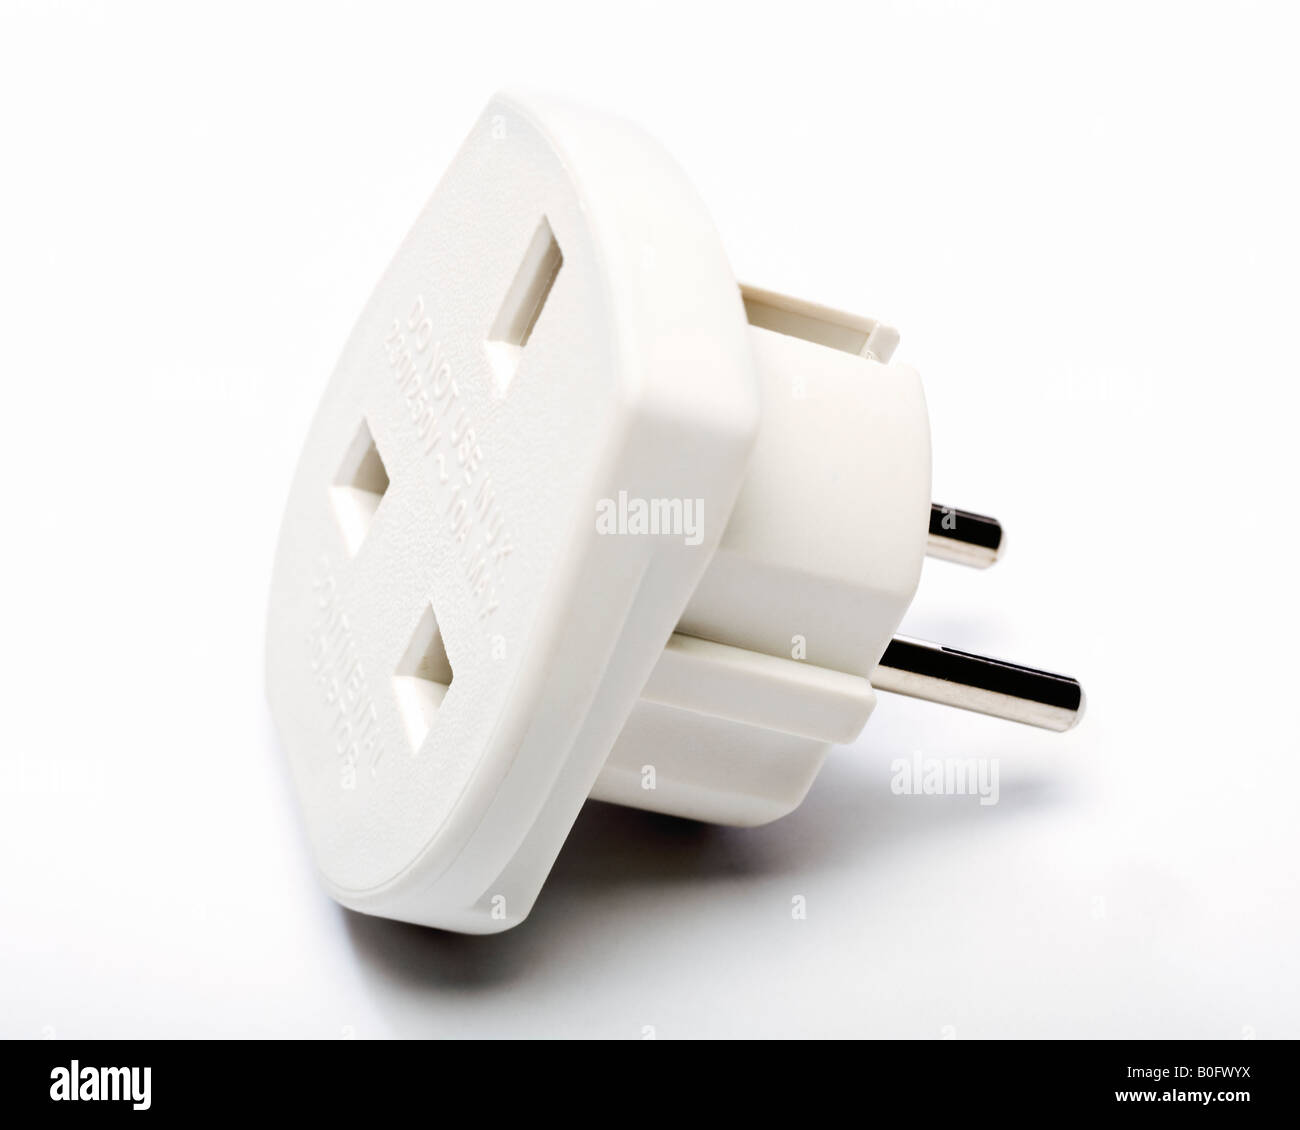 Spina europea adattatore - spina UK 3 pin a 2 pin europeo spina adattatore da viaggio Immagini Stock